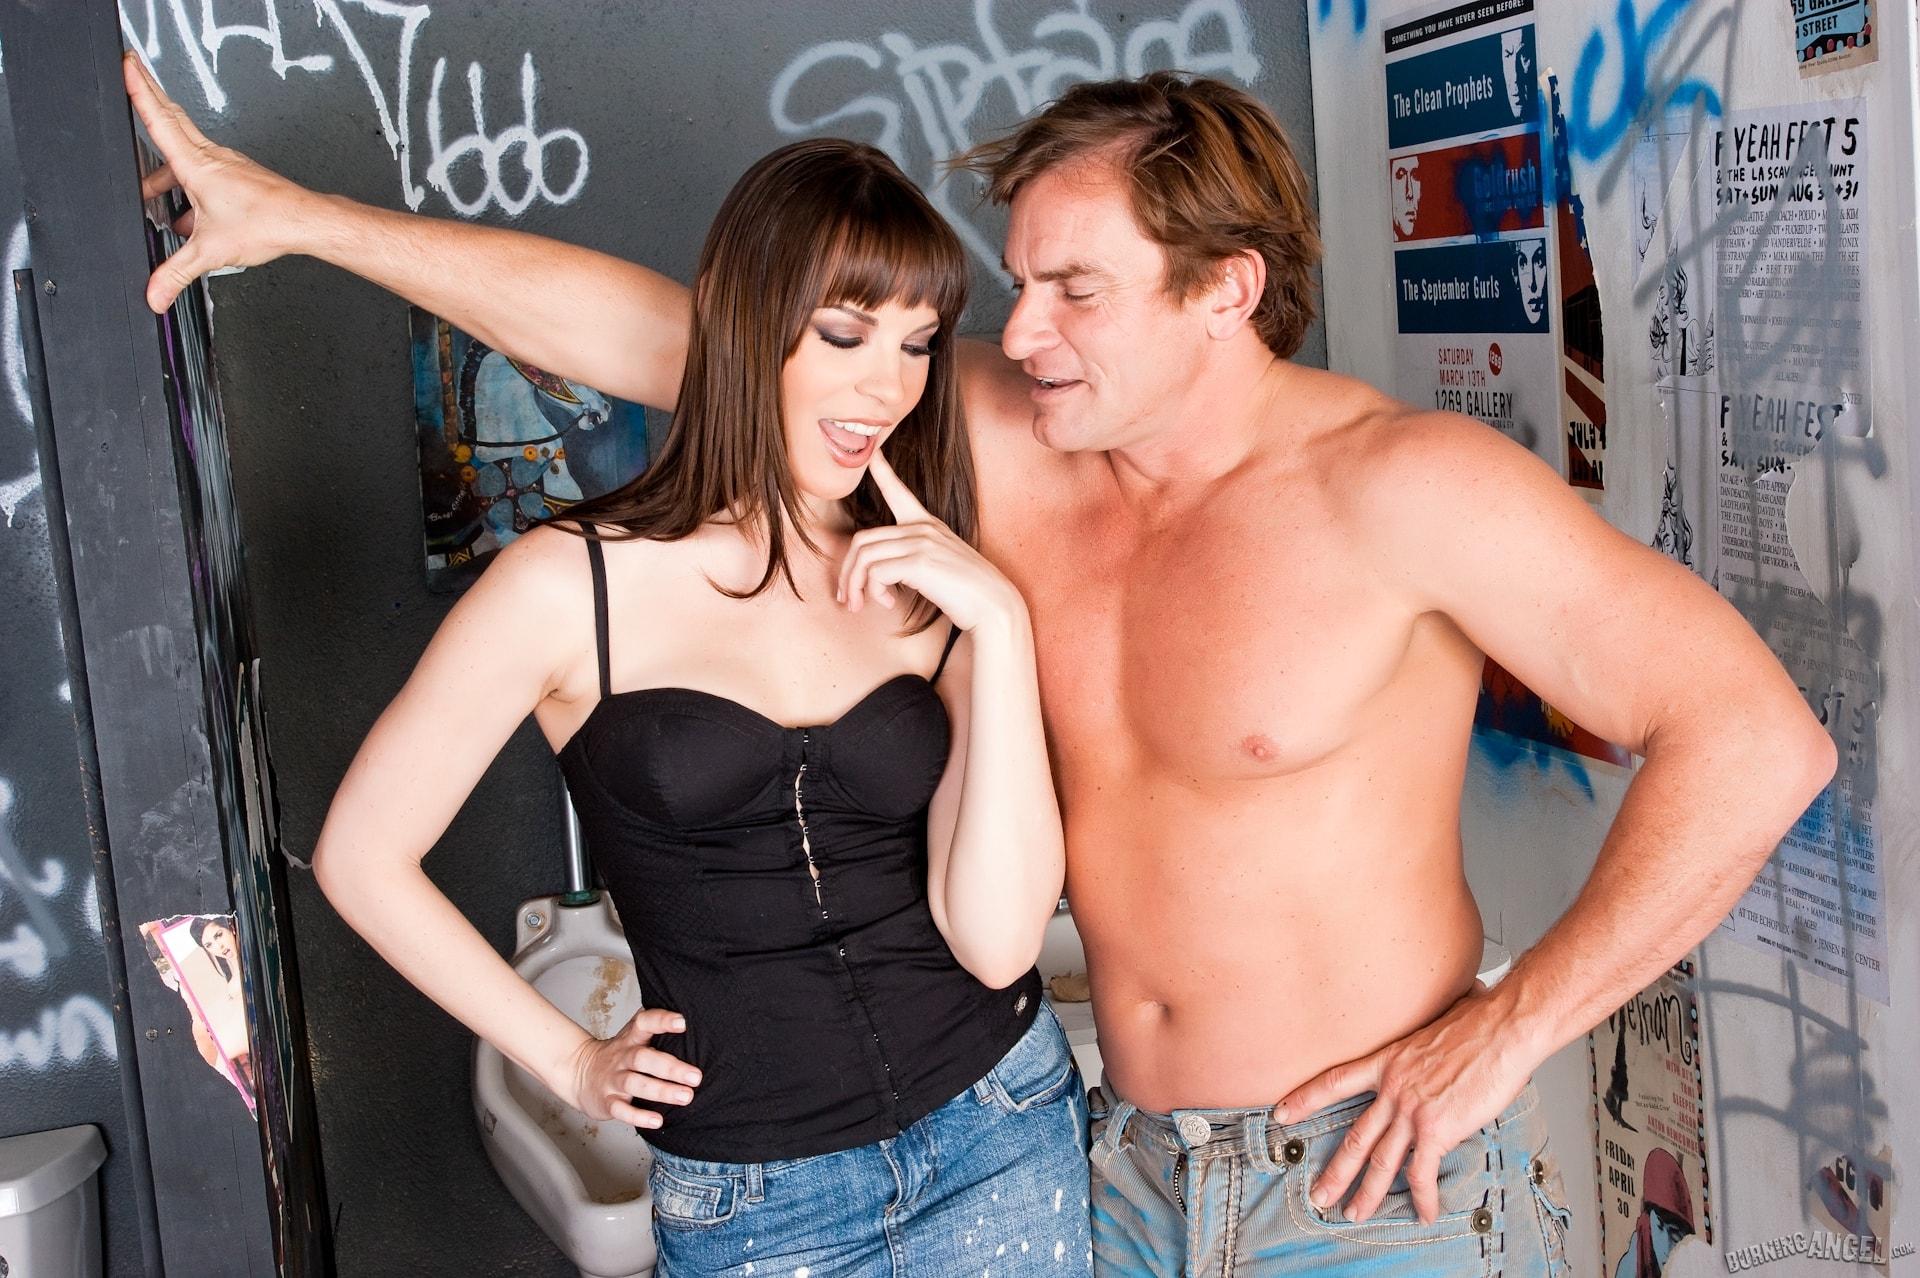 Burning Angel 'Dana is Crazy For Evan' starring Dana DeArmond (Photo 1)